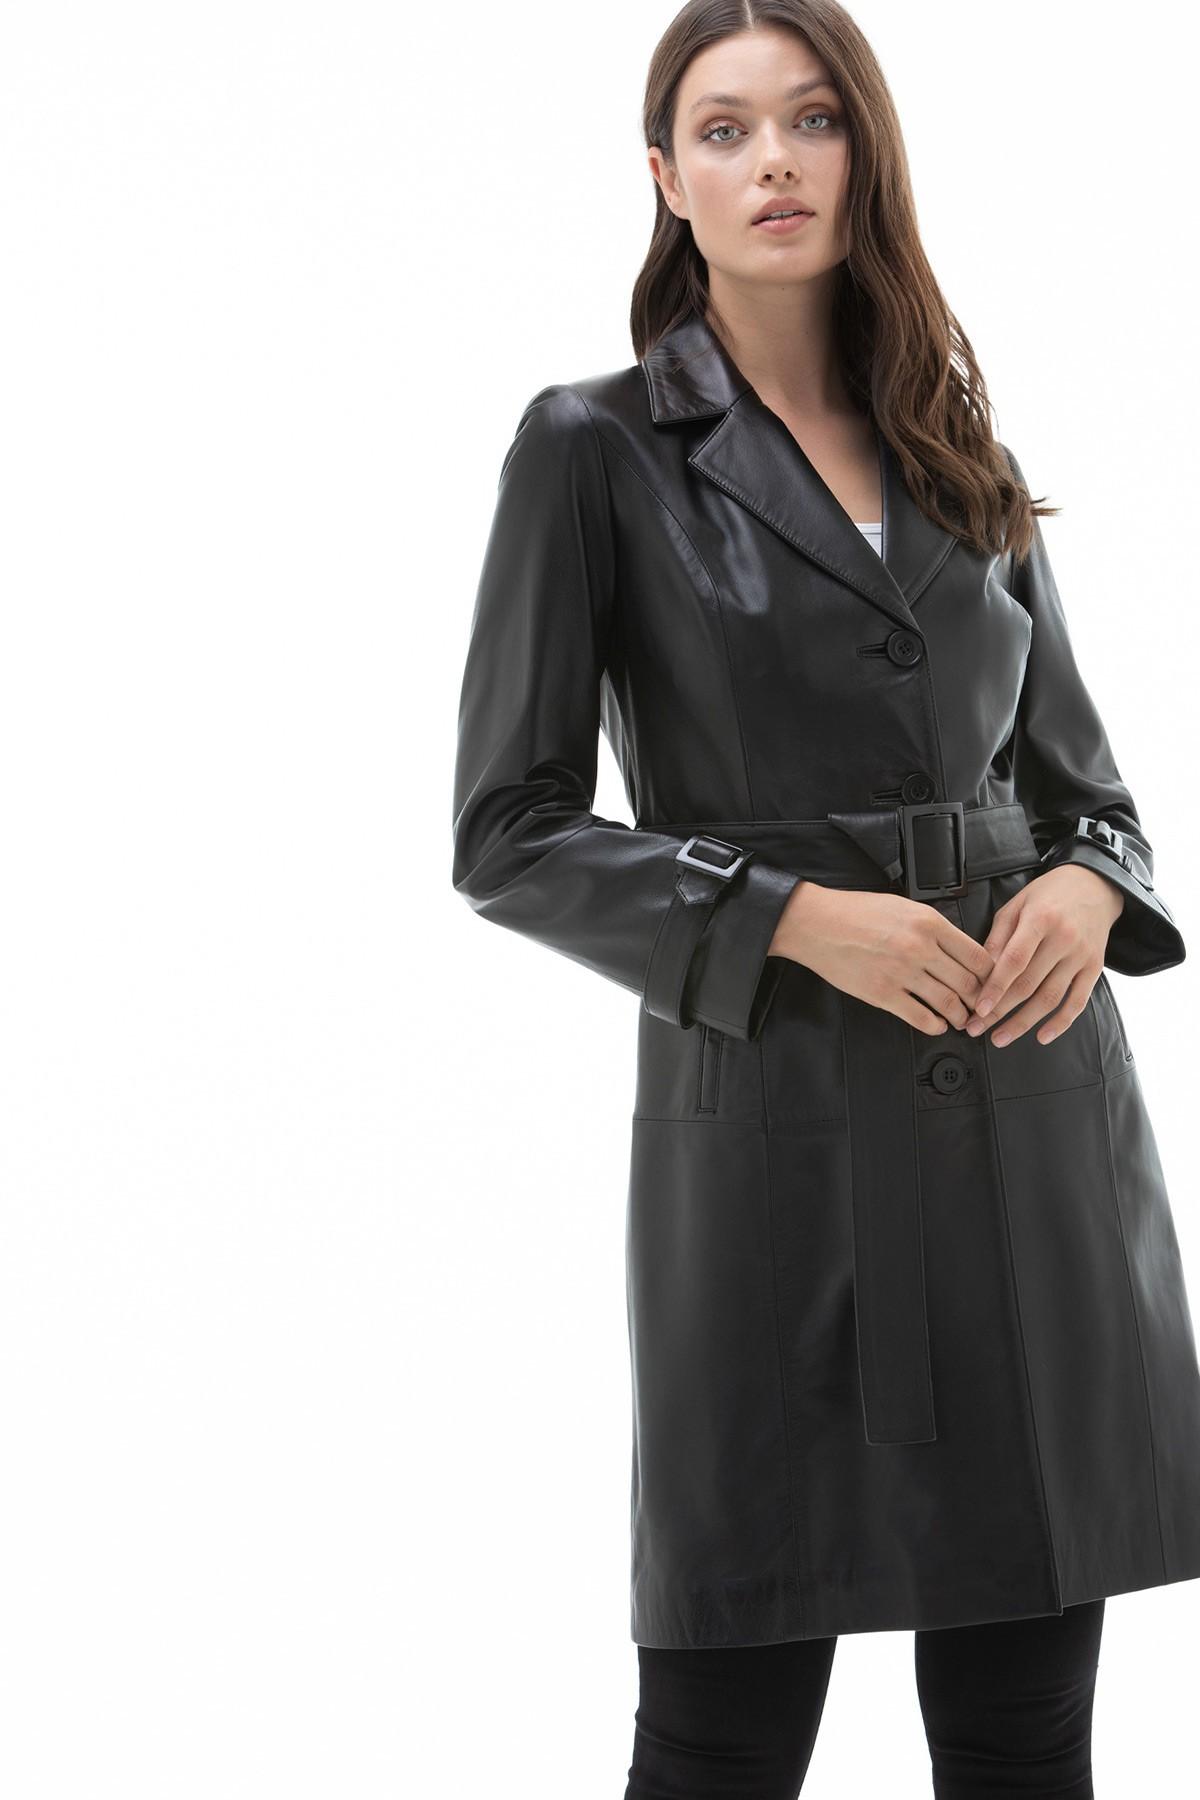 Women's Lambskin Leather Coats